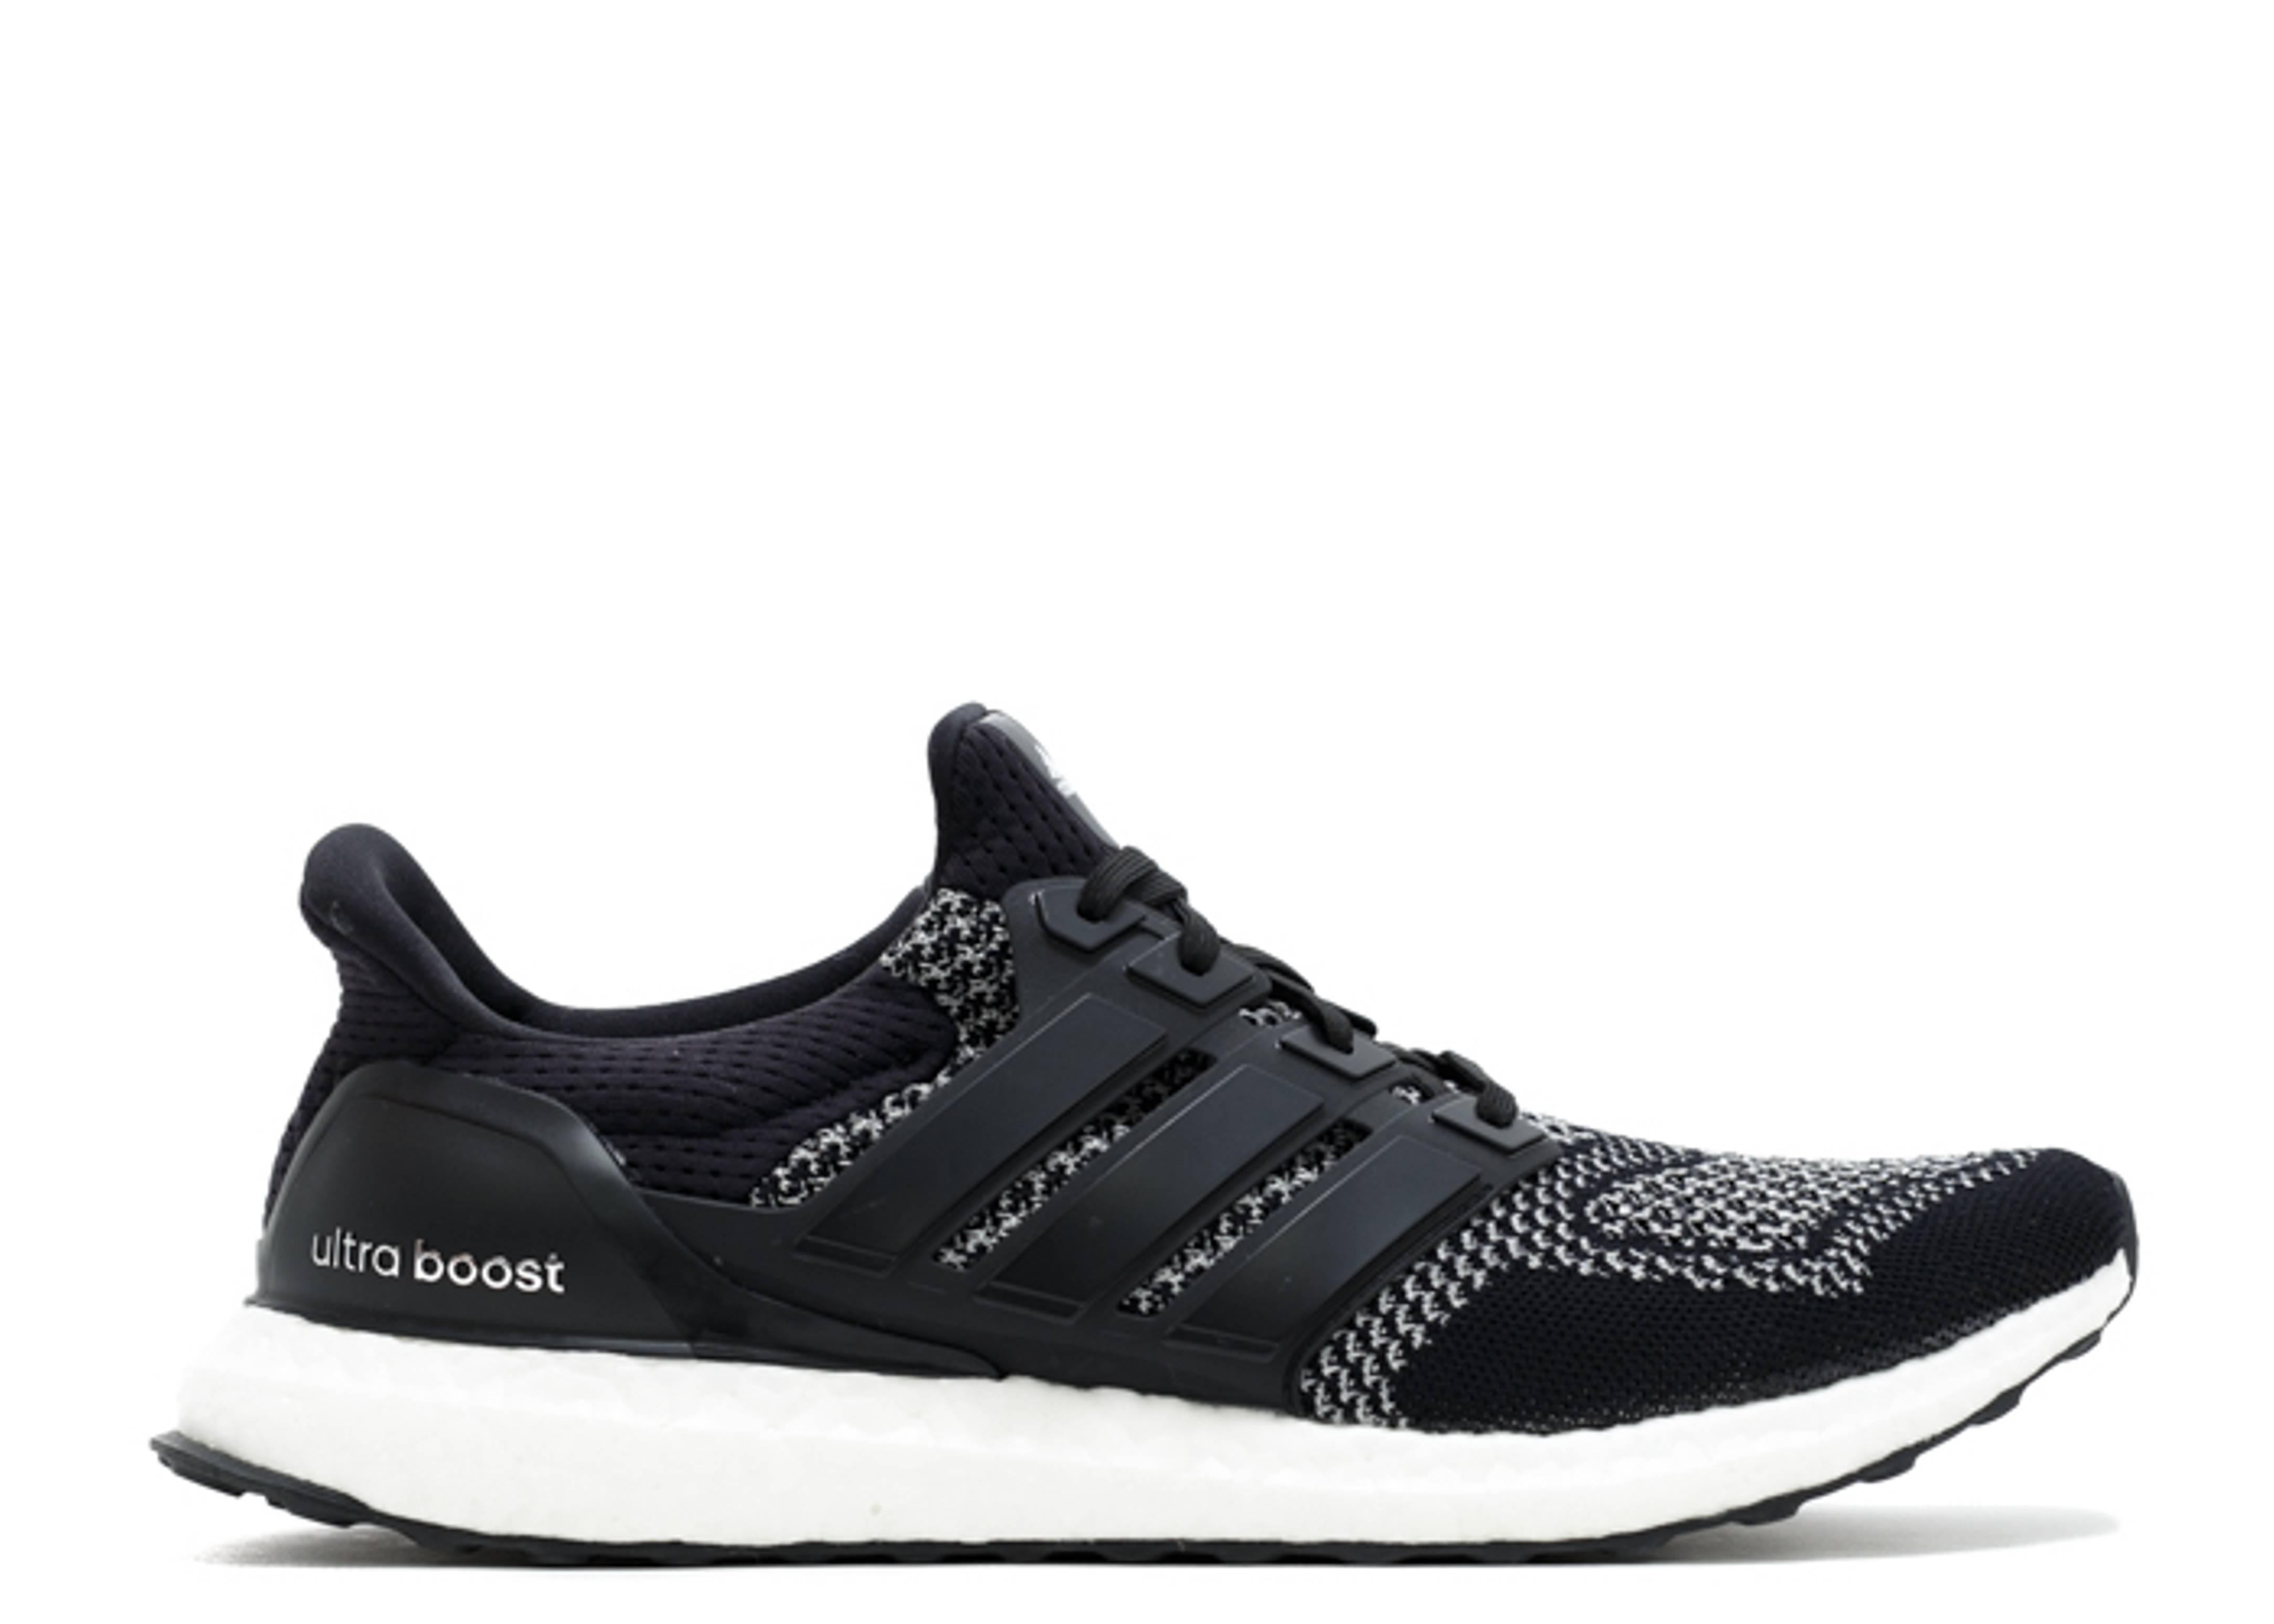 Adidas Ultra Boost Reflective